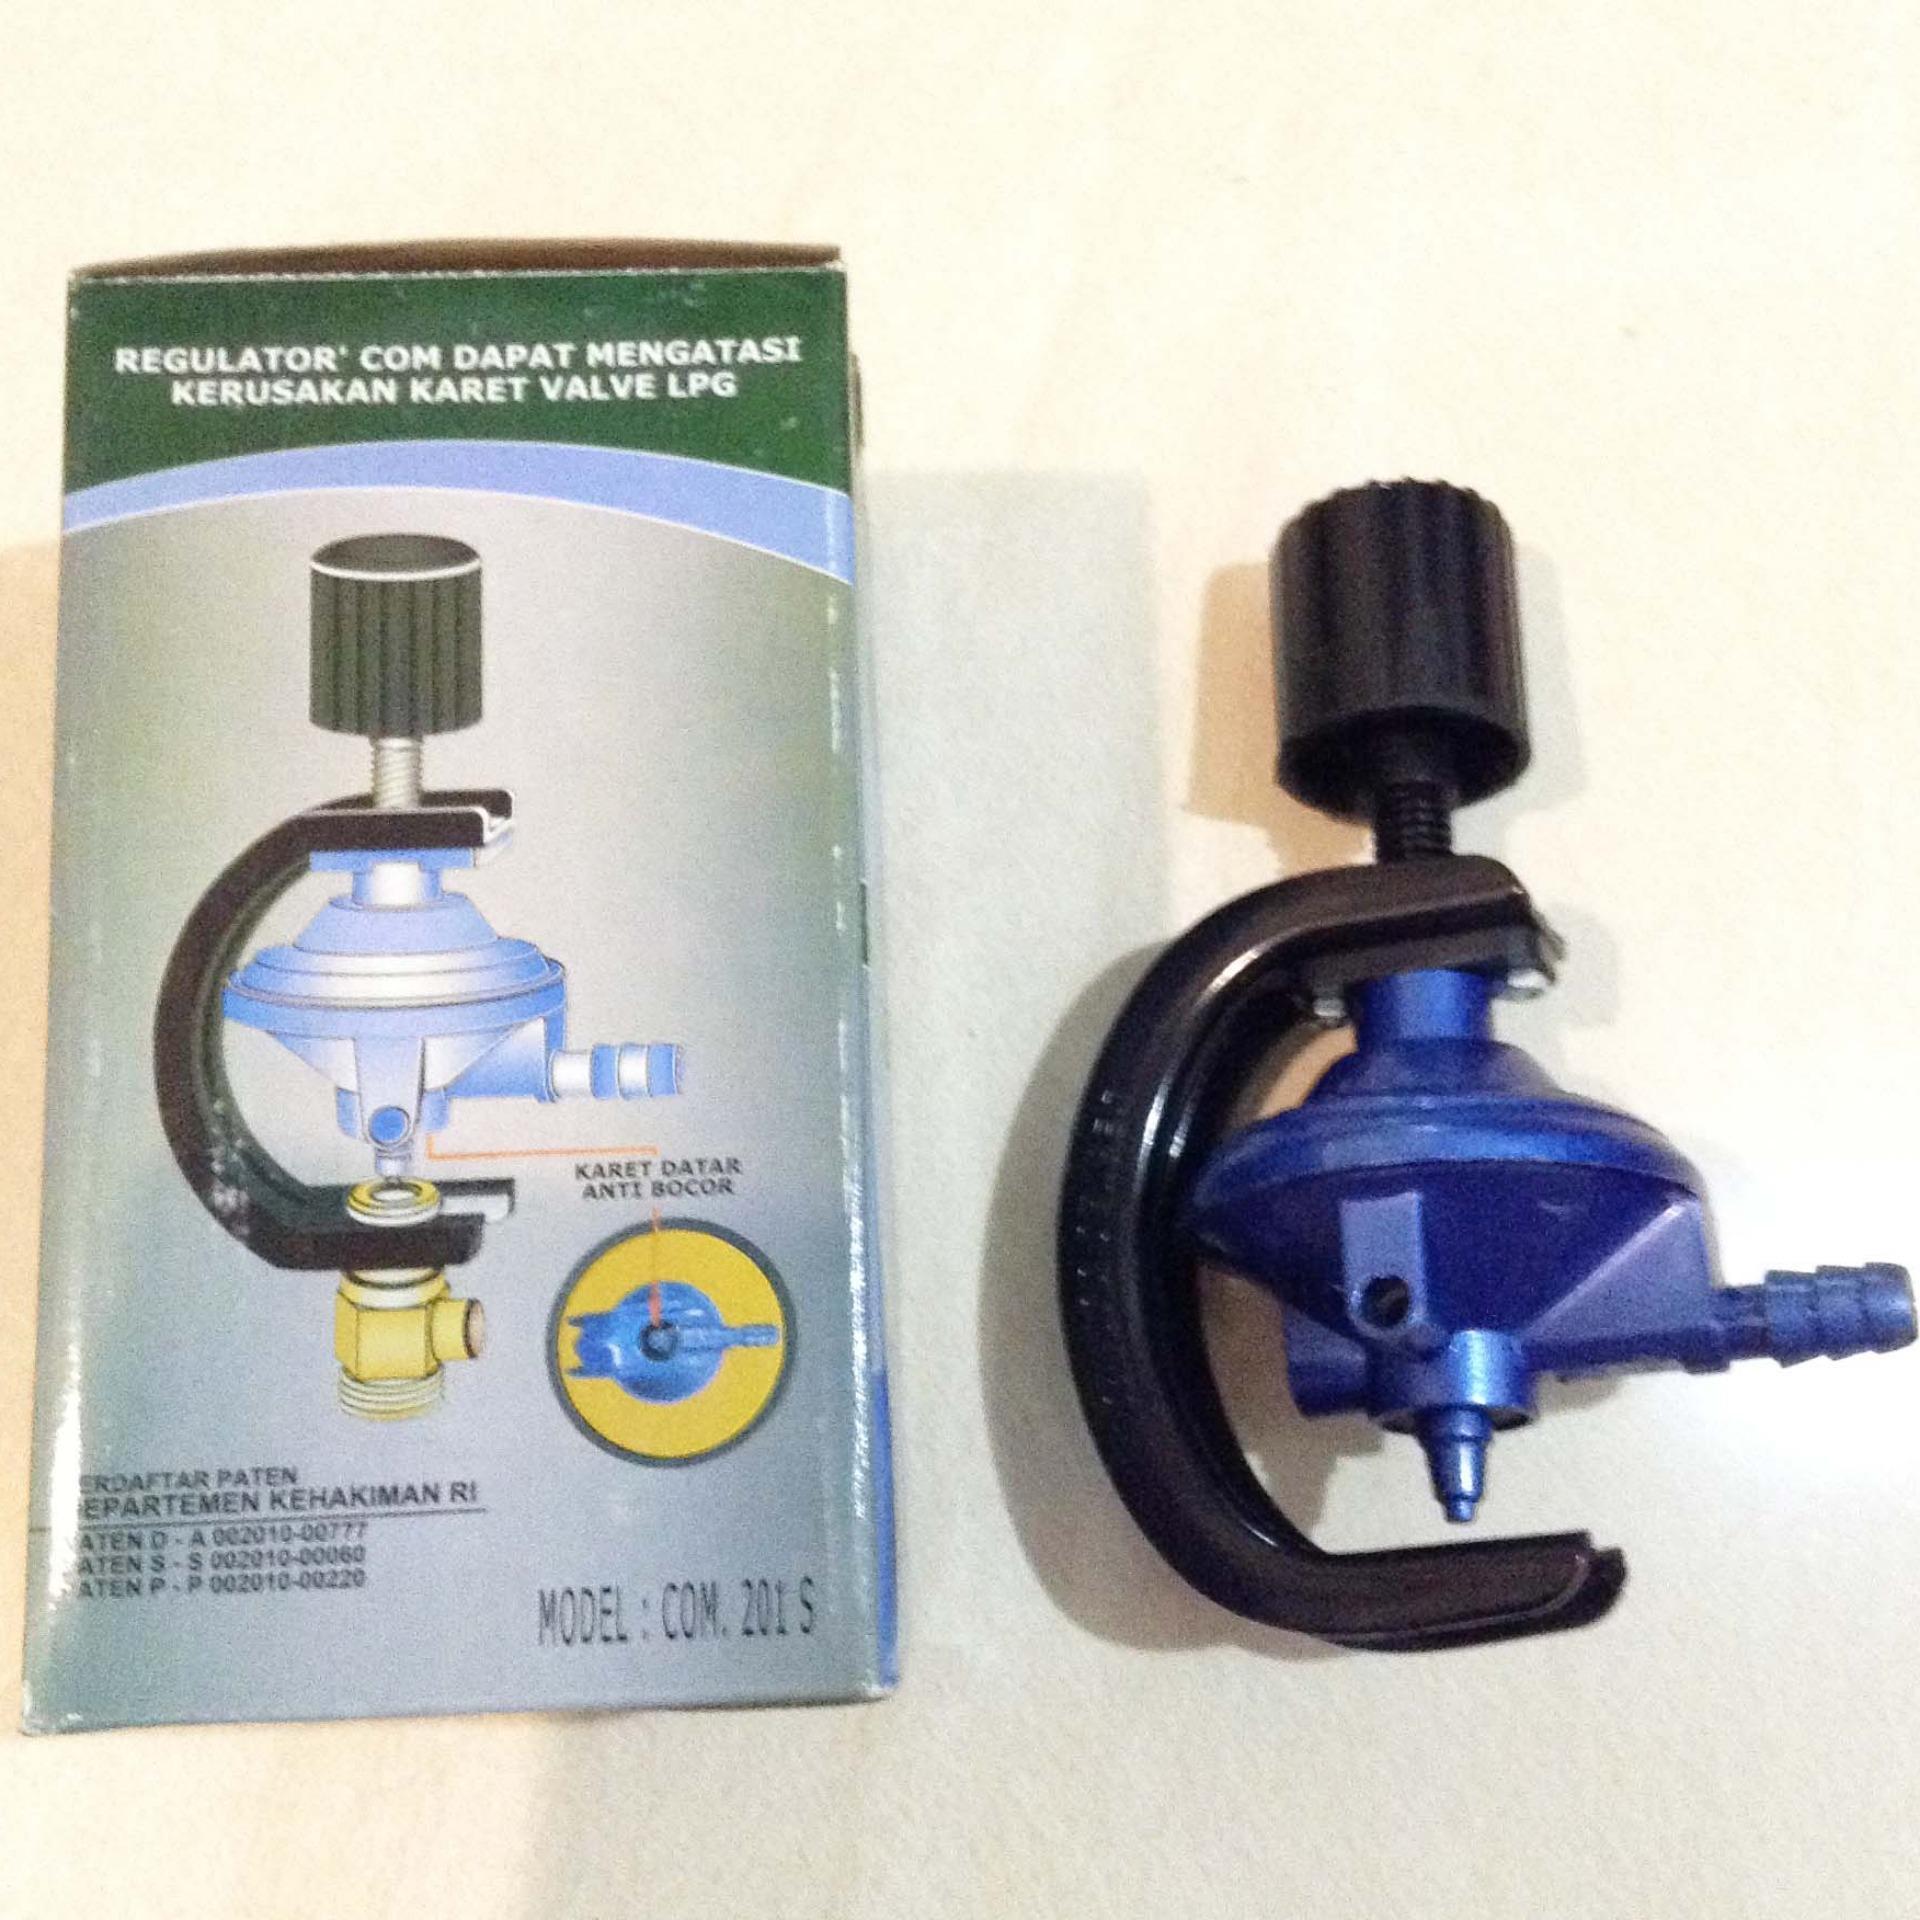 Price Checker Destec Com 201 S Regulator Gas Lpg Anti Bocor Double M Protection